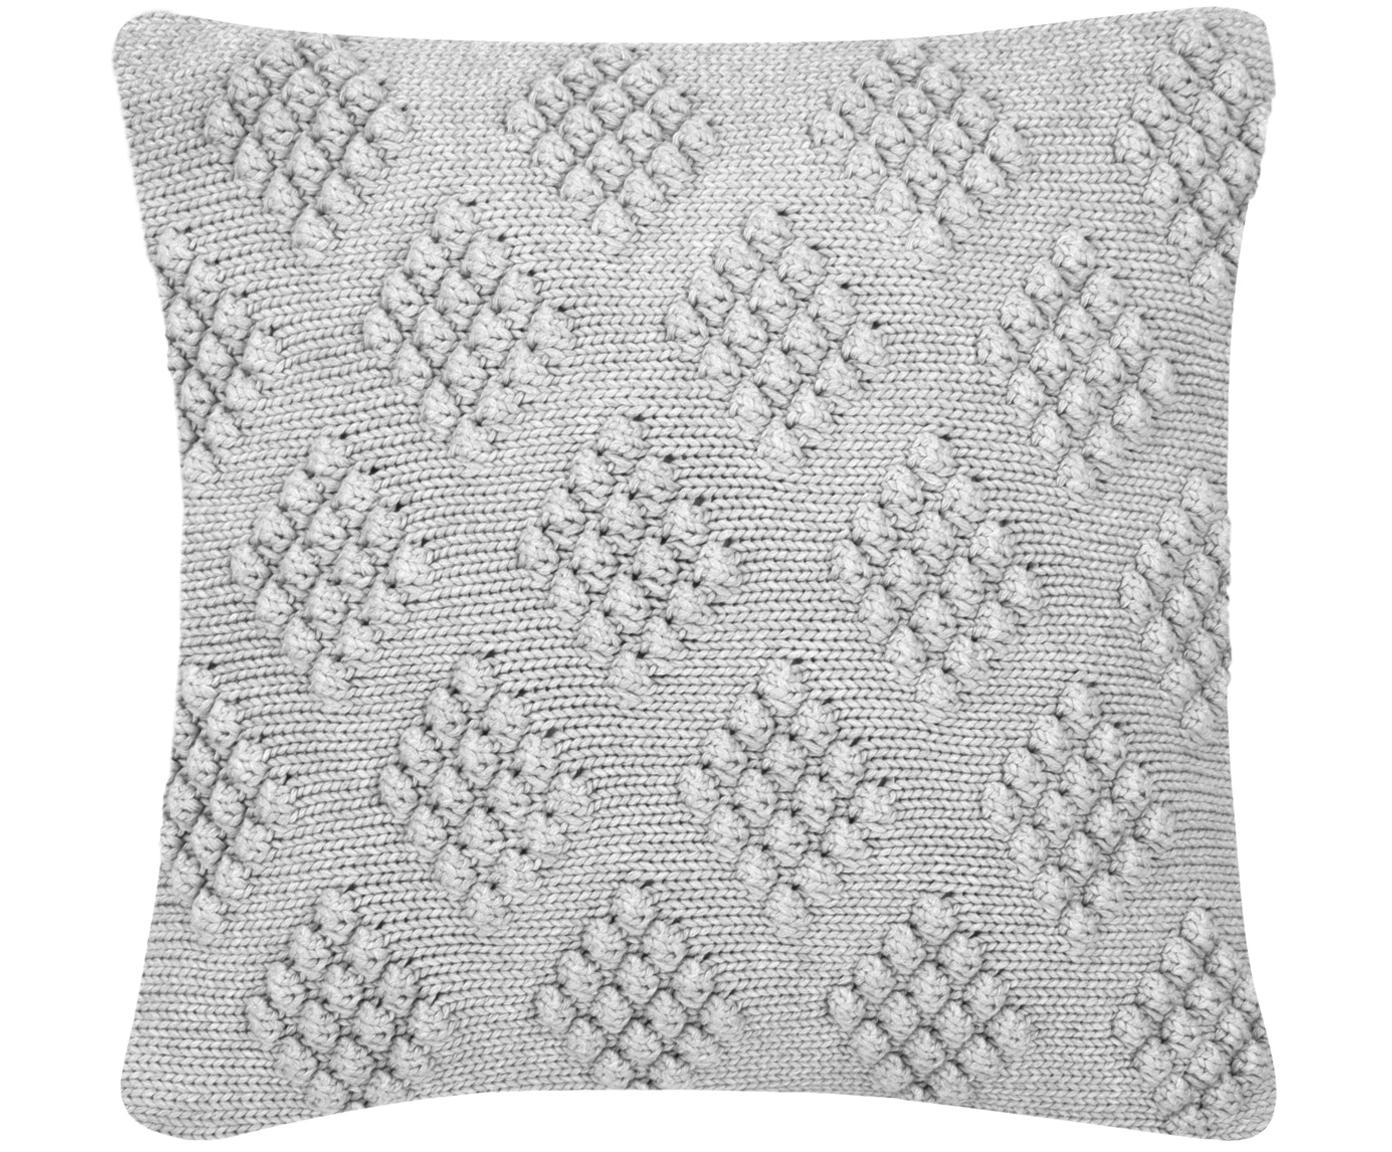 Funda de cojín de punto Kelly, 100%algodón, Gris claro, An 40 x L 40 cm